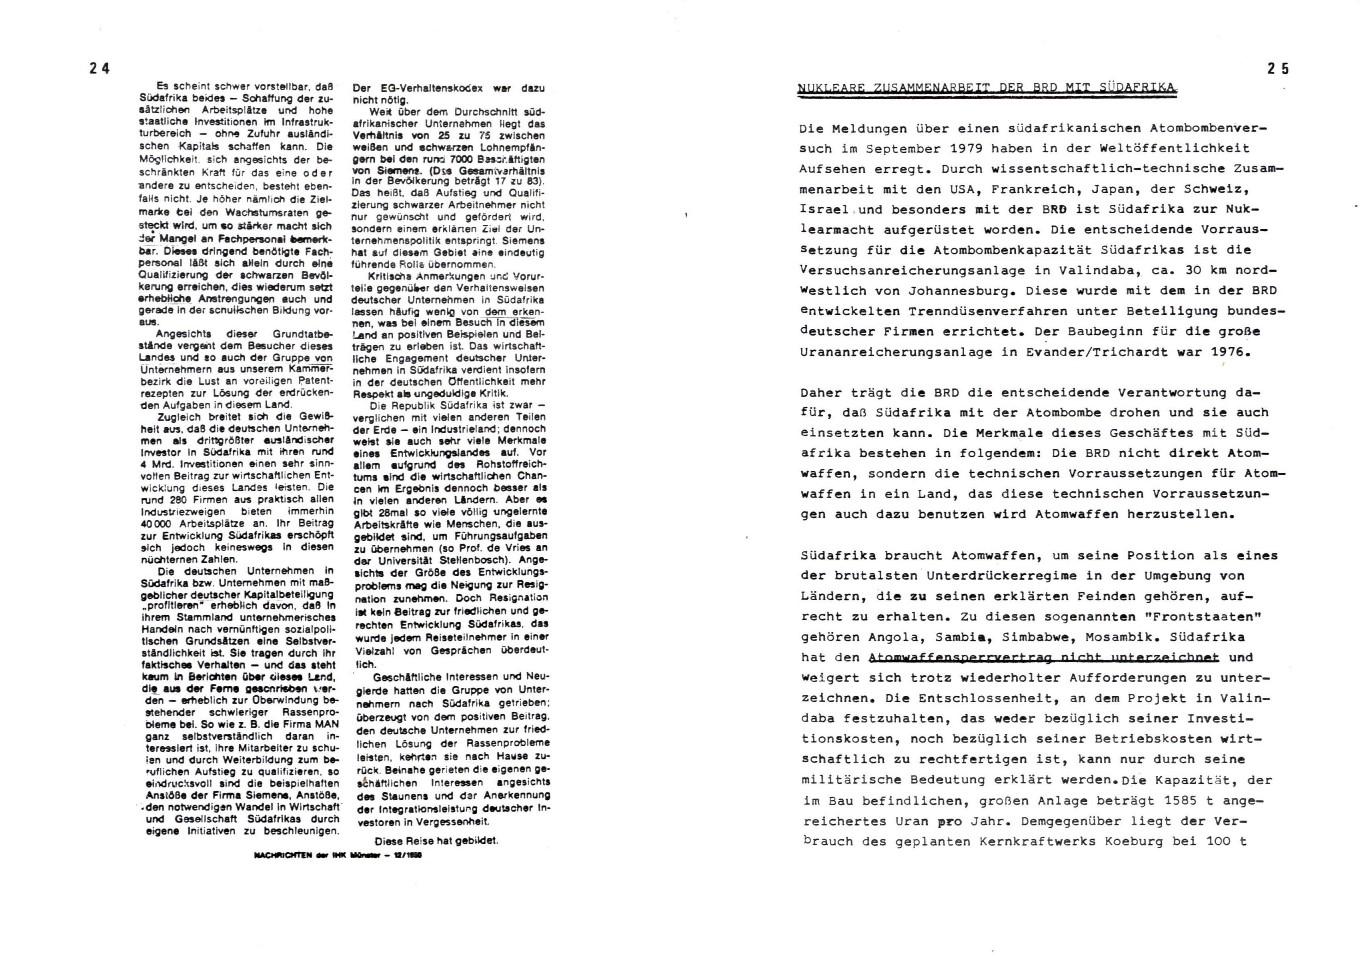 Muenster_AKAFRIK_1981_Suedafrika_BRD_14